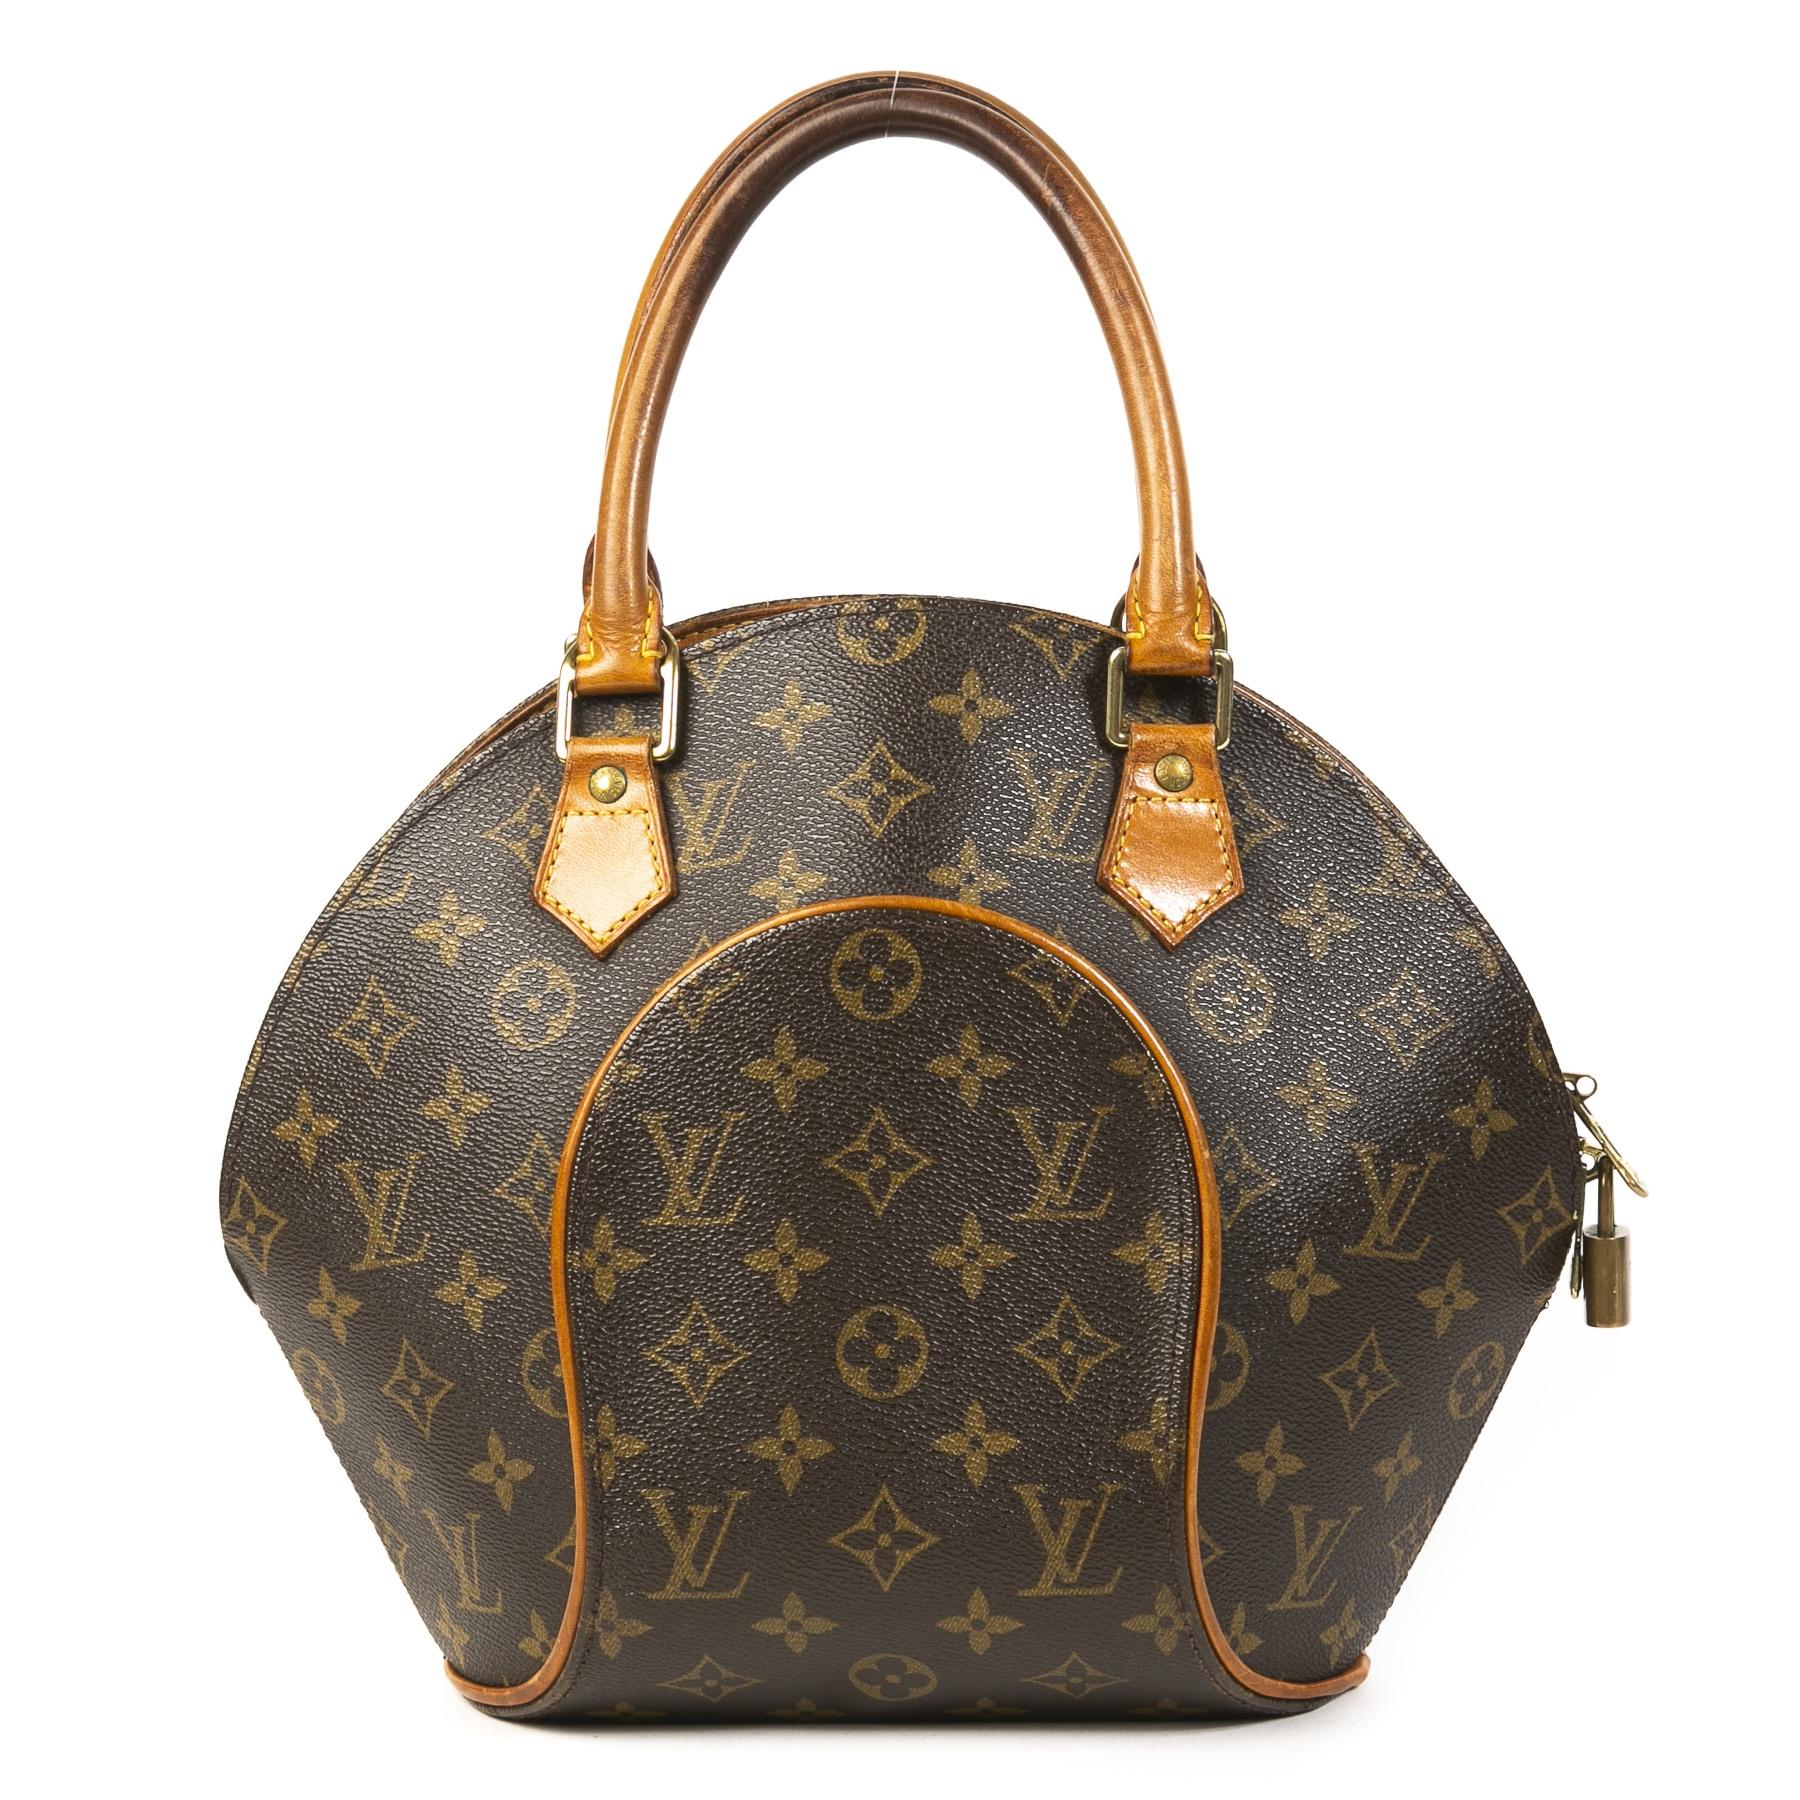 Authentieke tweedehands vintage Louis Vuitton Monogram Ellipse PM Bag koop online webshop LabelLOV